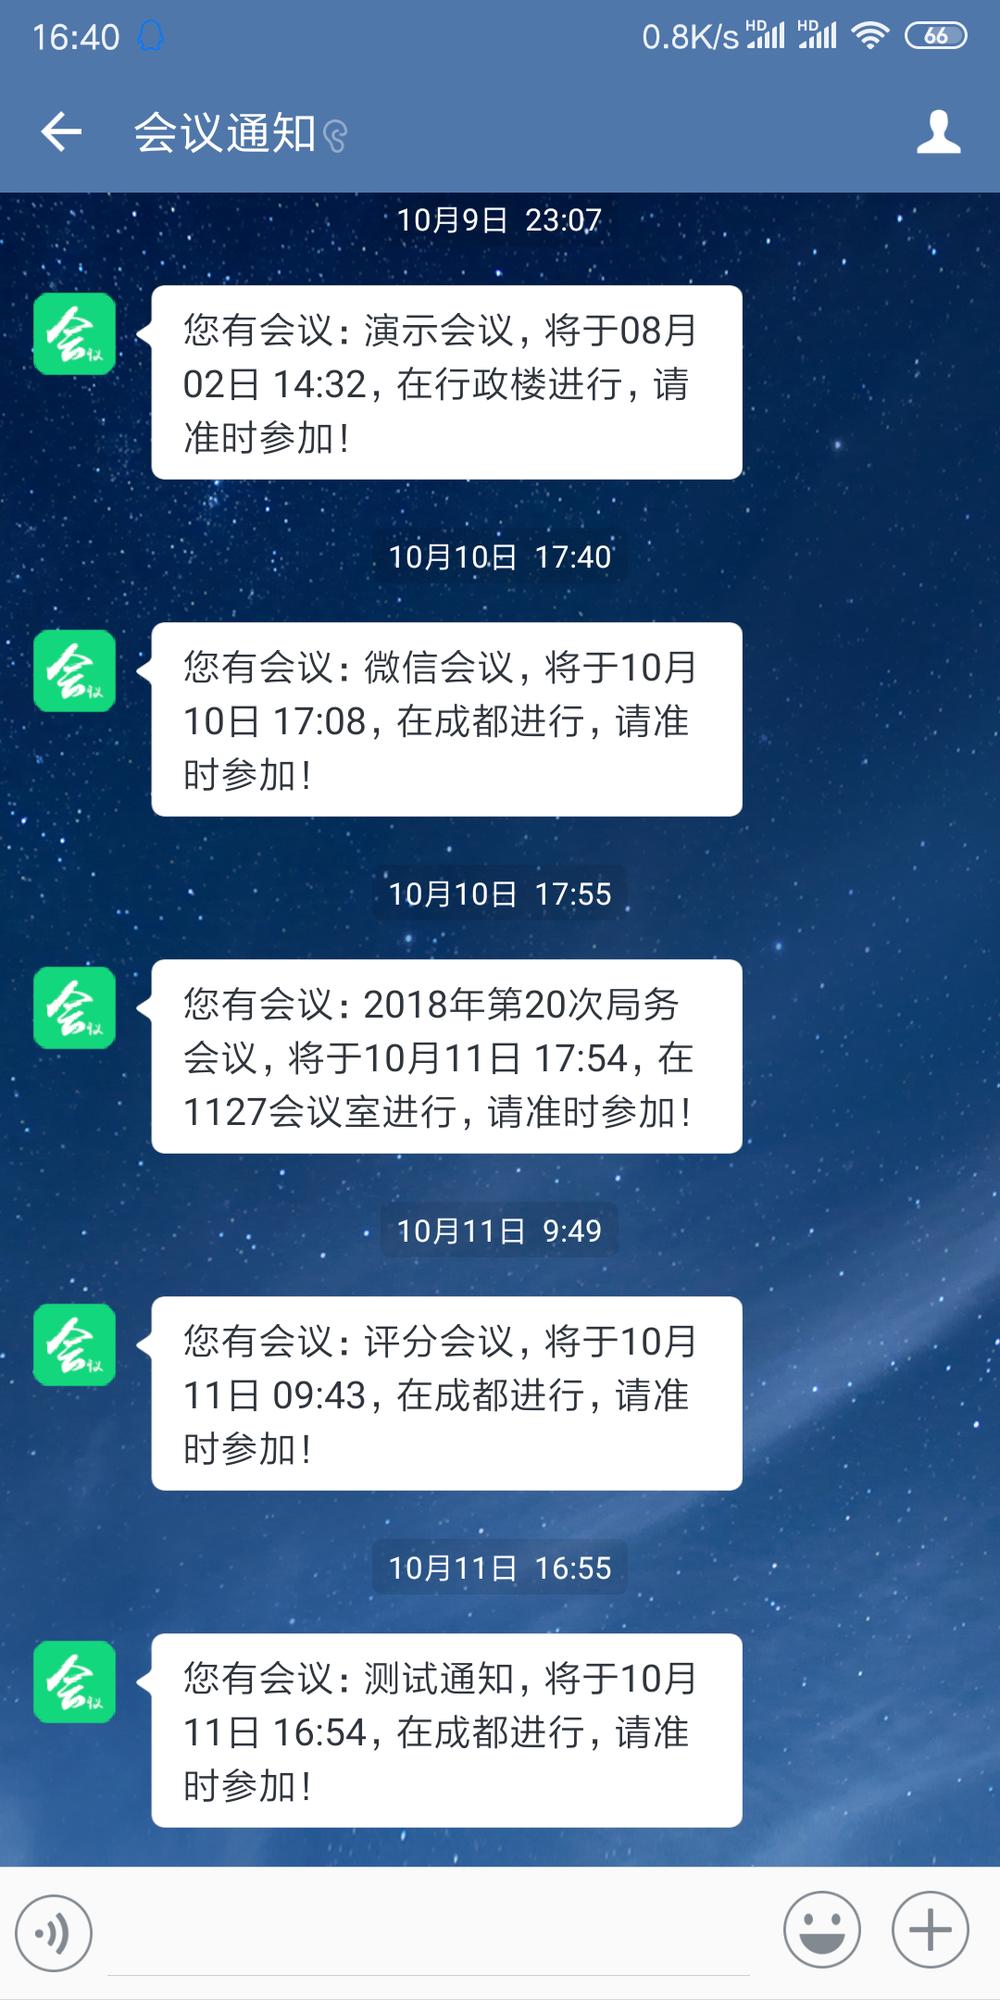 QQ图片20181216164011.png